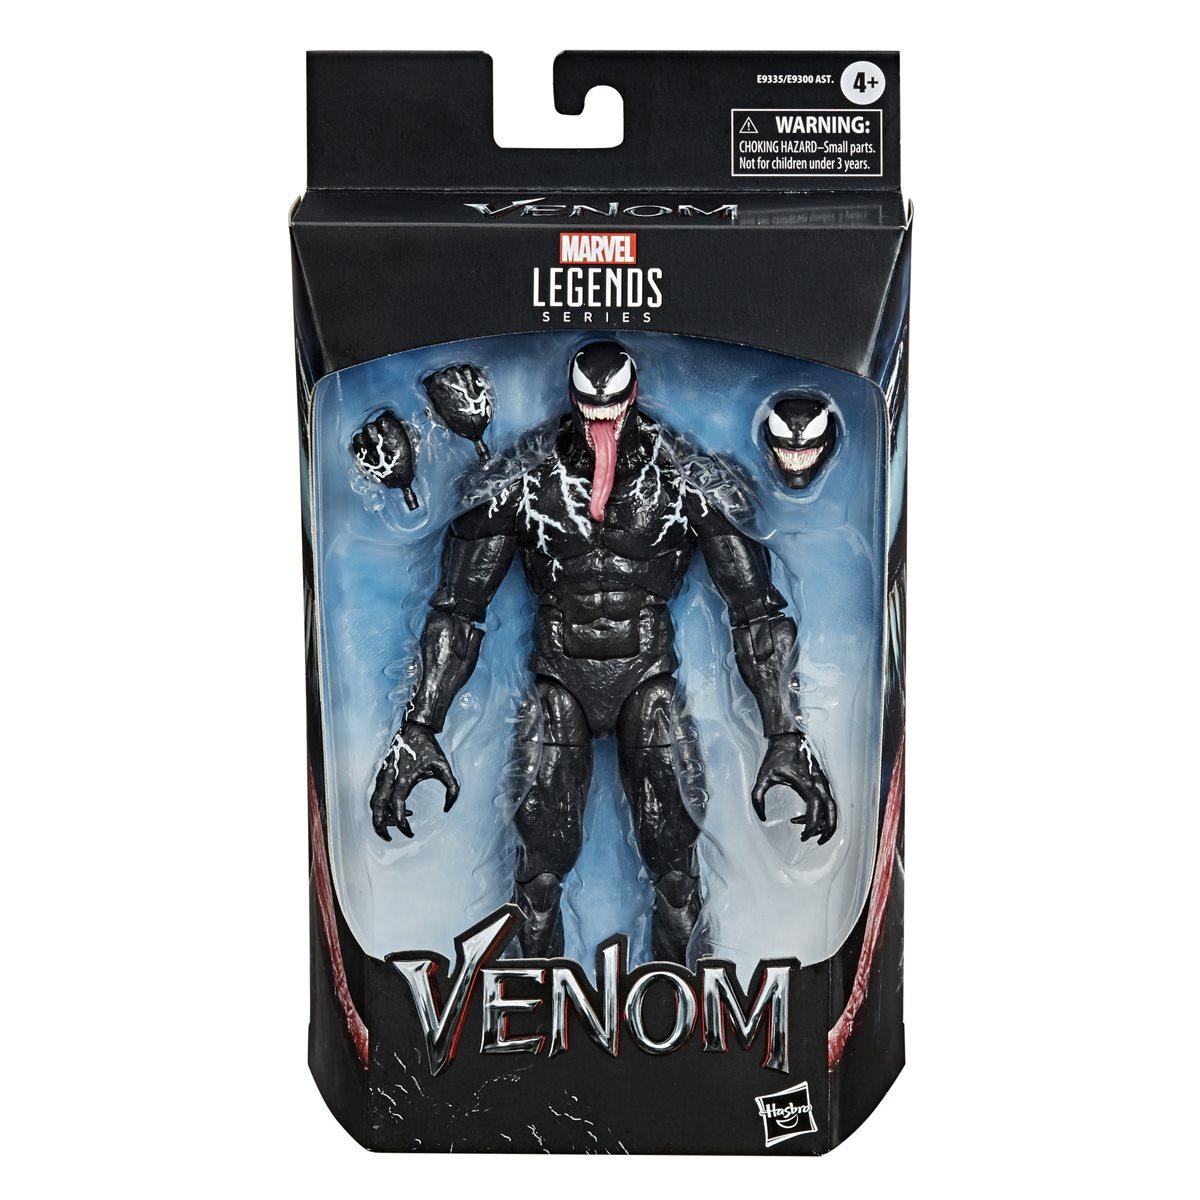 Action Figure Venom: Marvel Legends Series - Hasbro